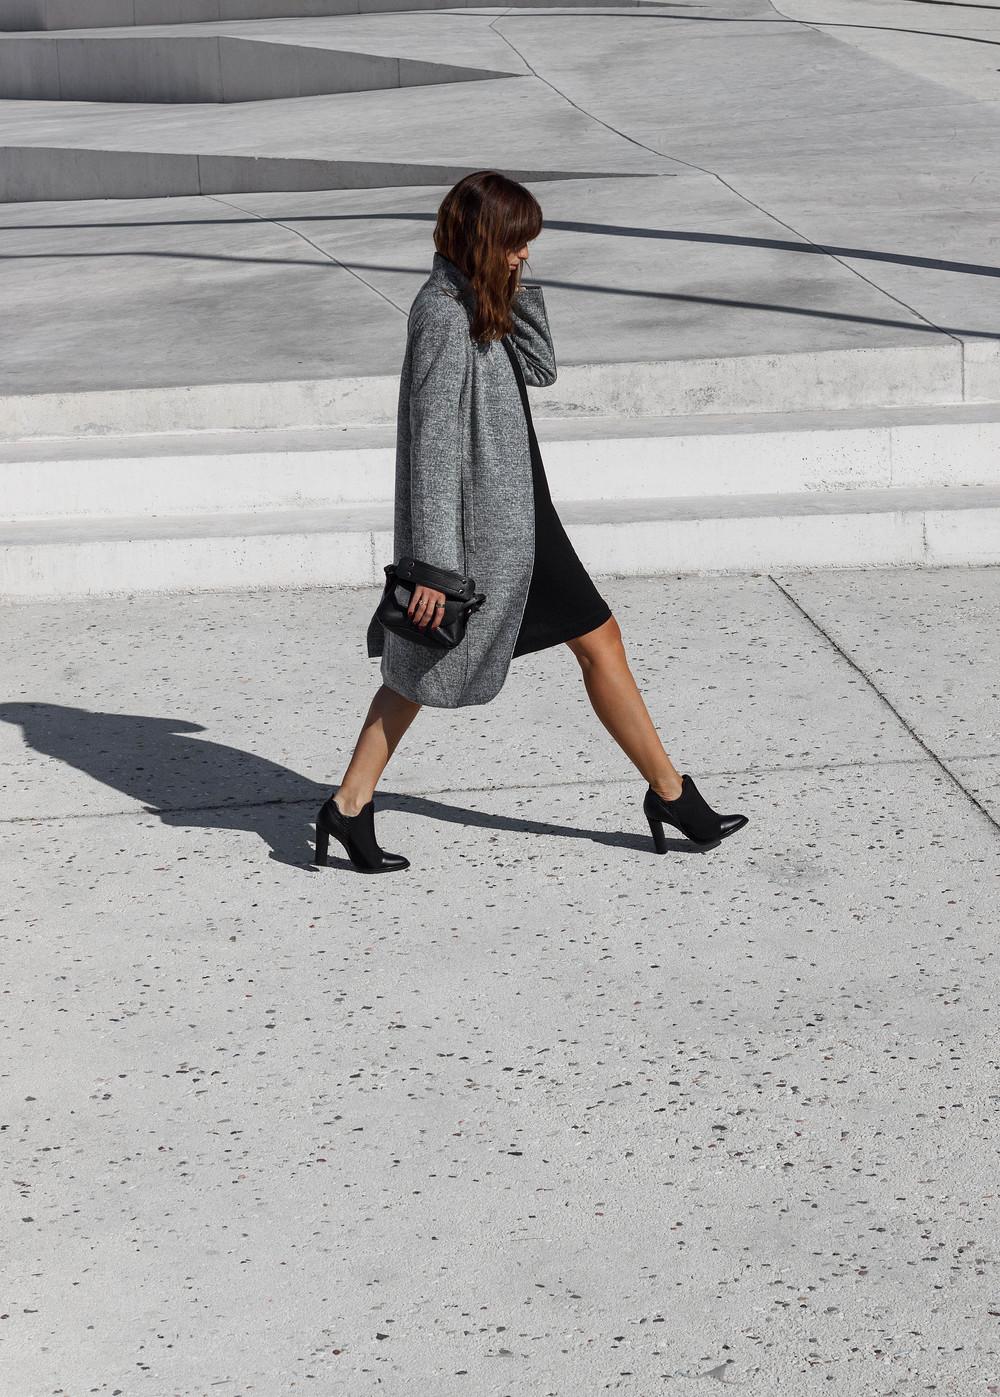 claire clouded revolution calvin klein jeans malta